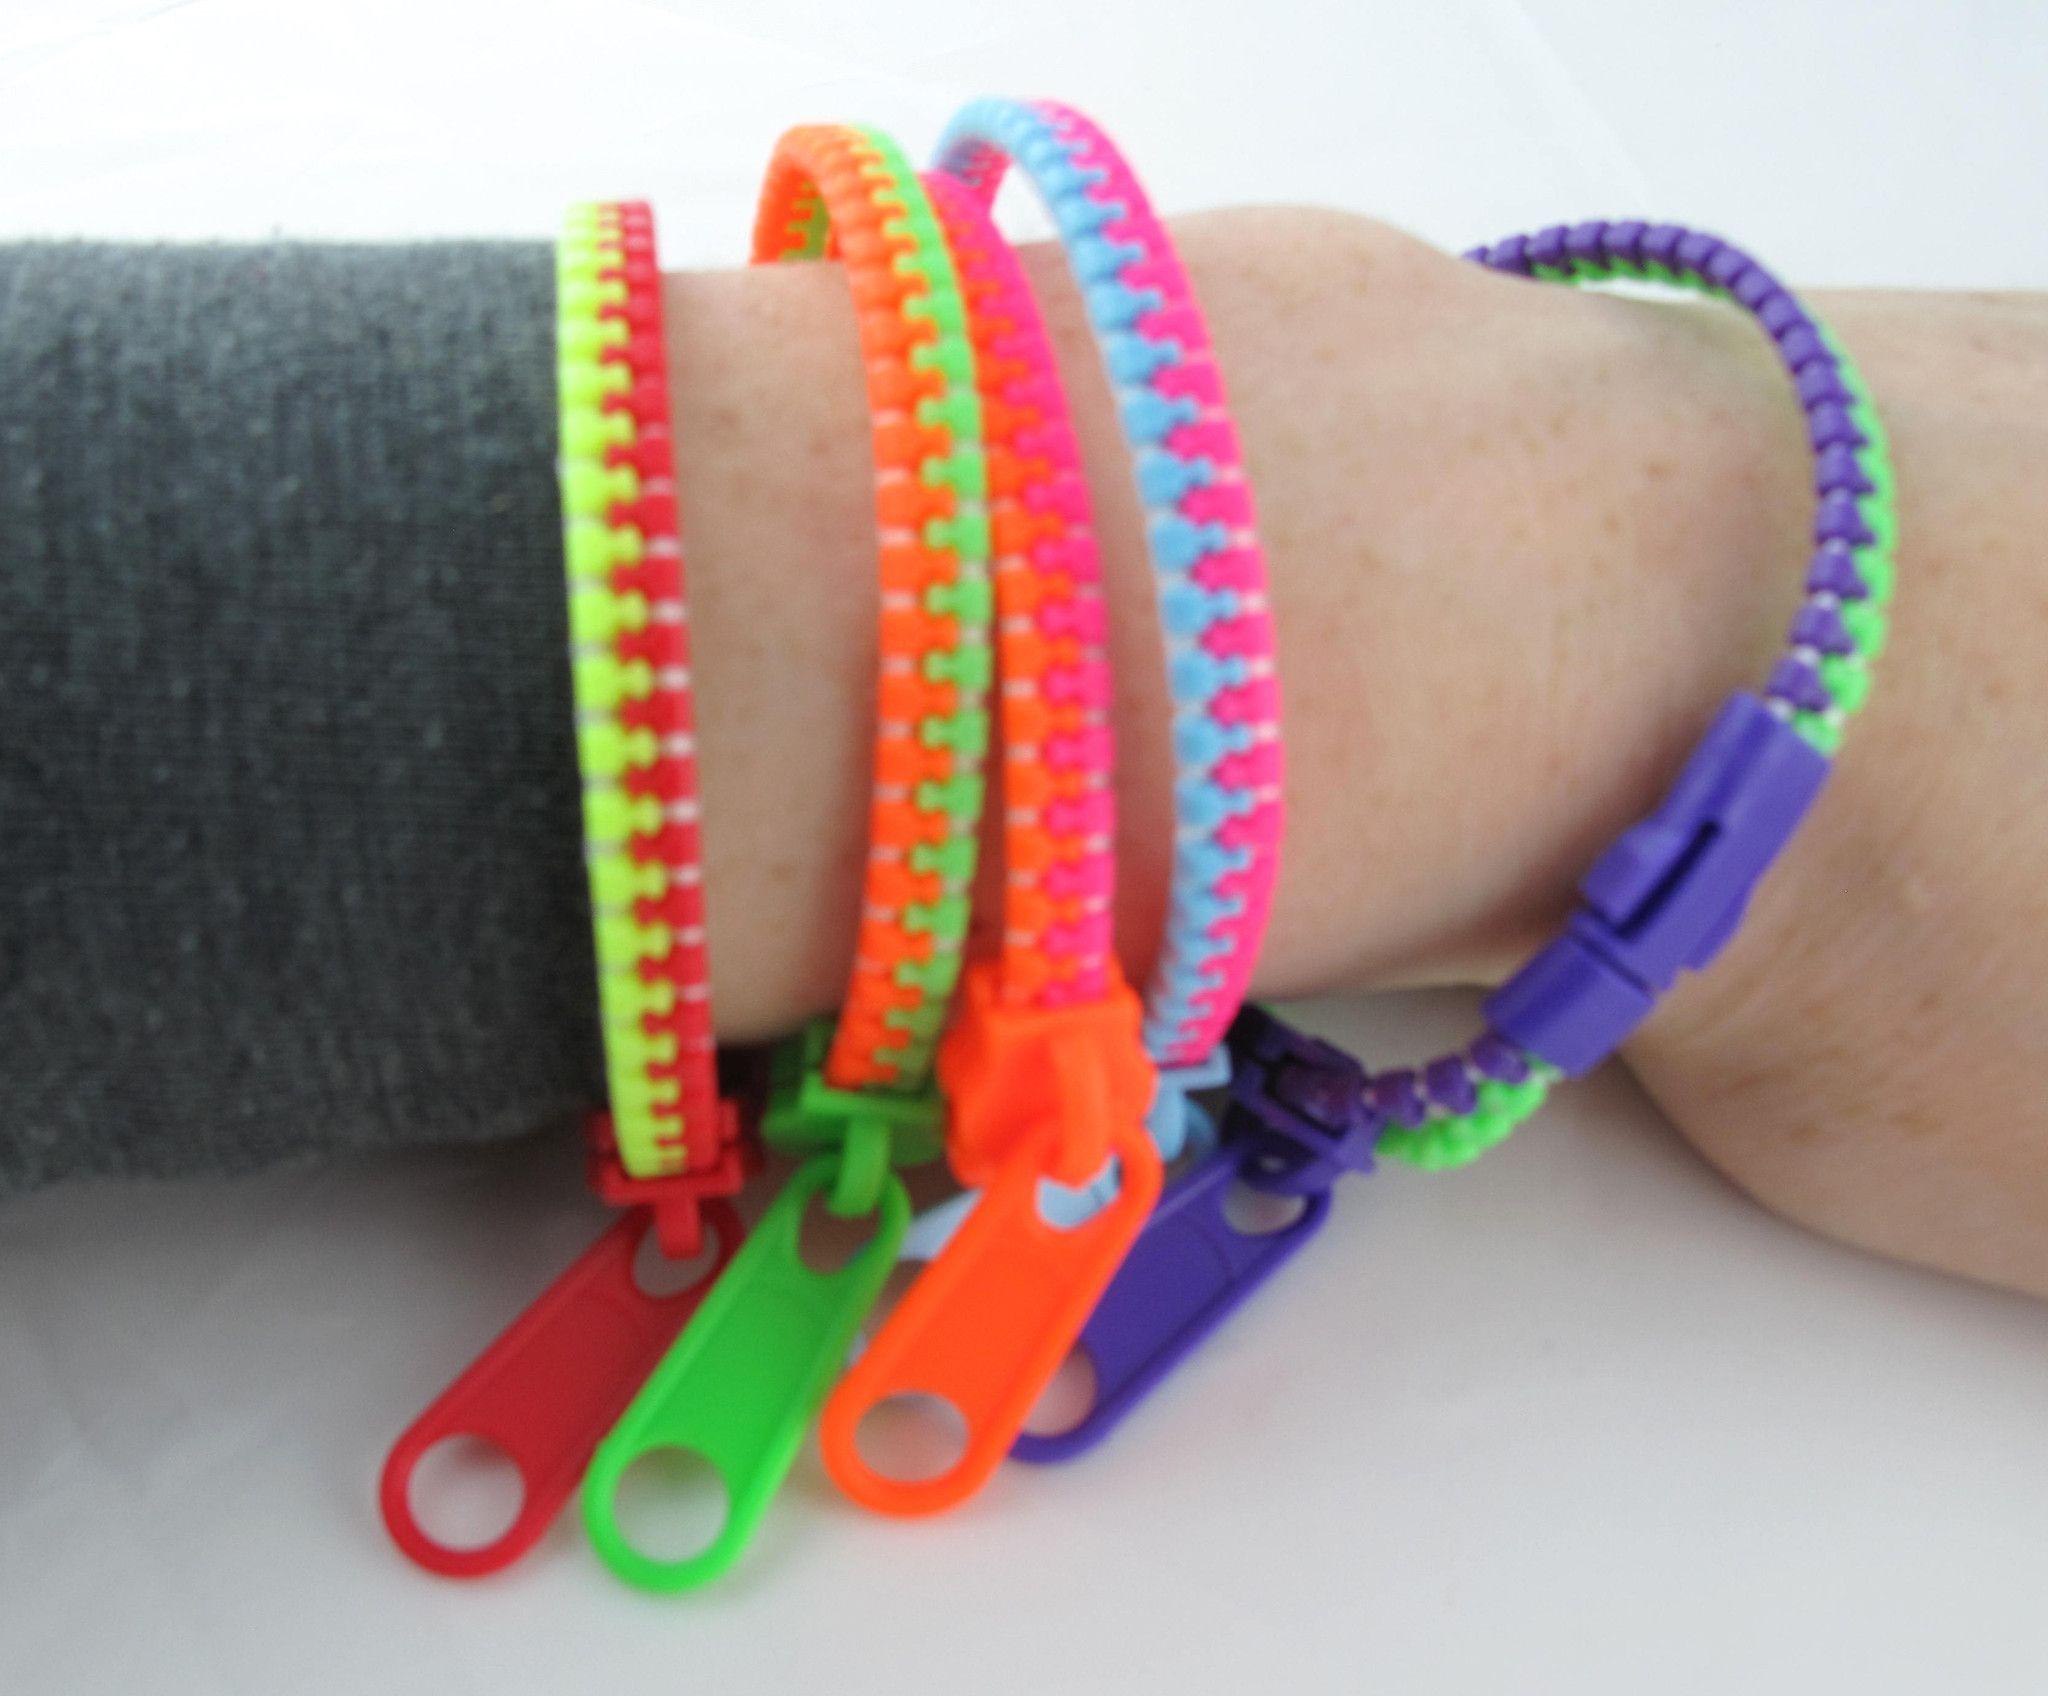 Zipper Bracelets Zipper bracelet, Sensory tools, Fidget